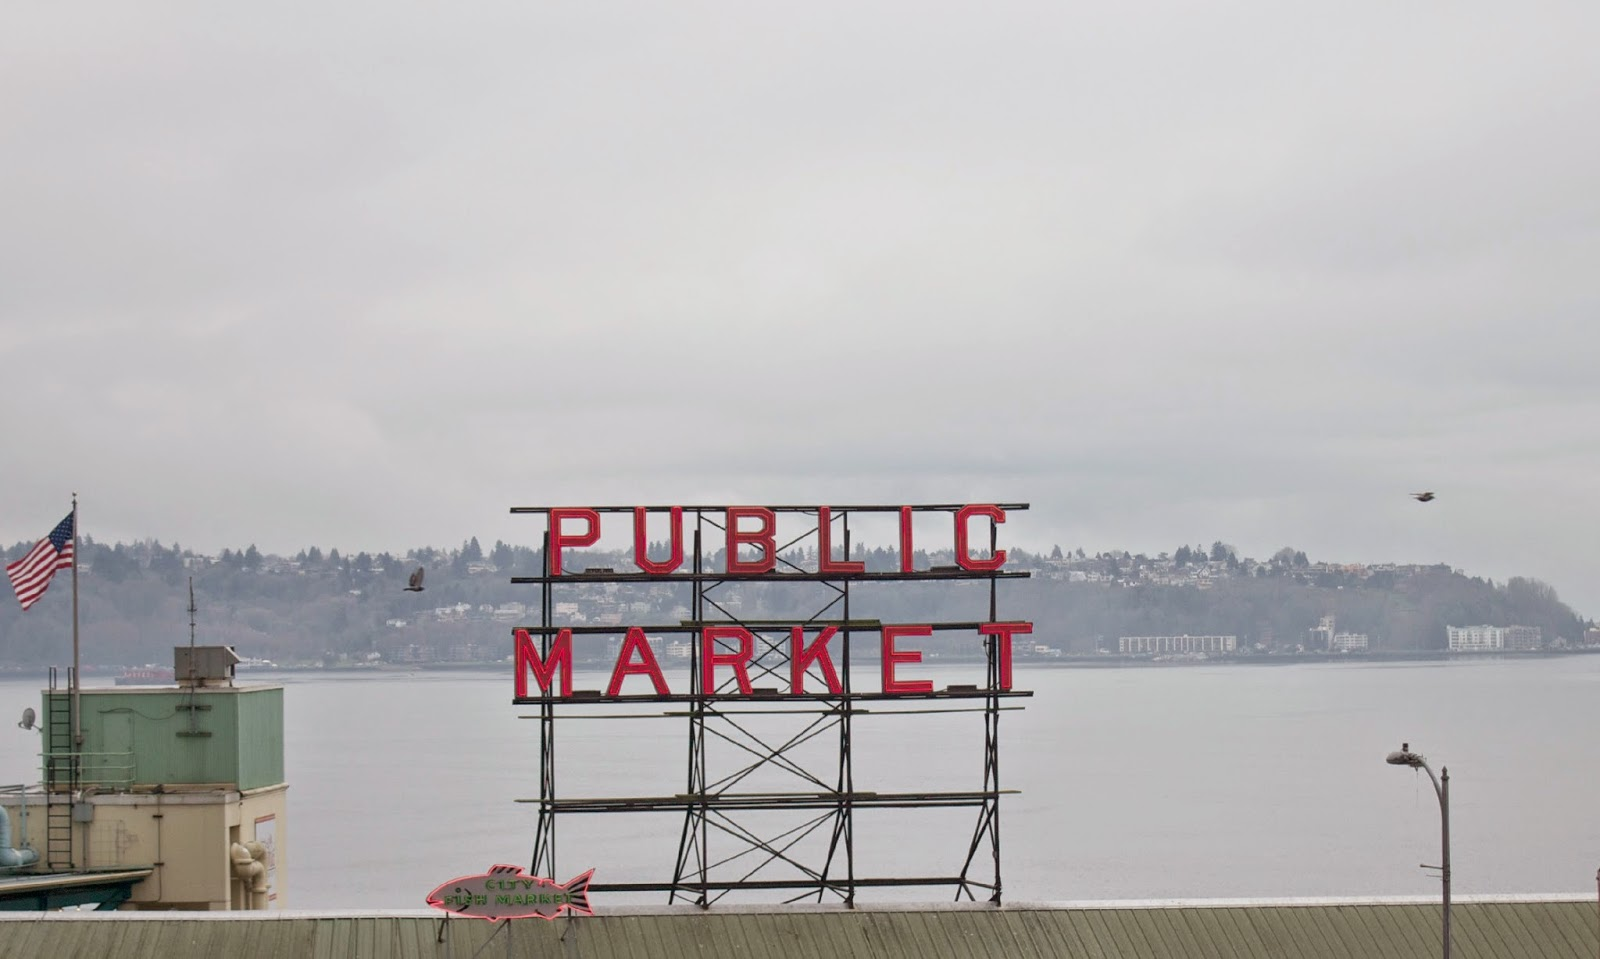 publicmarket.jpg